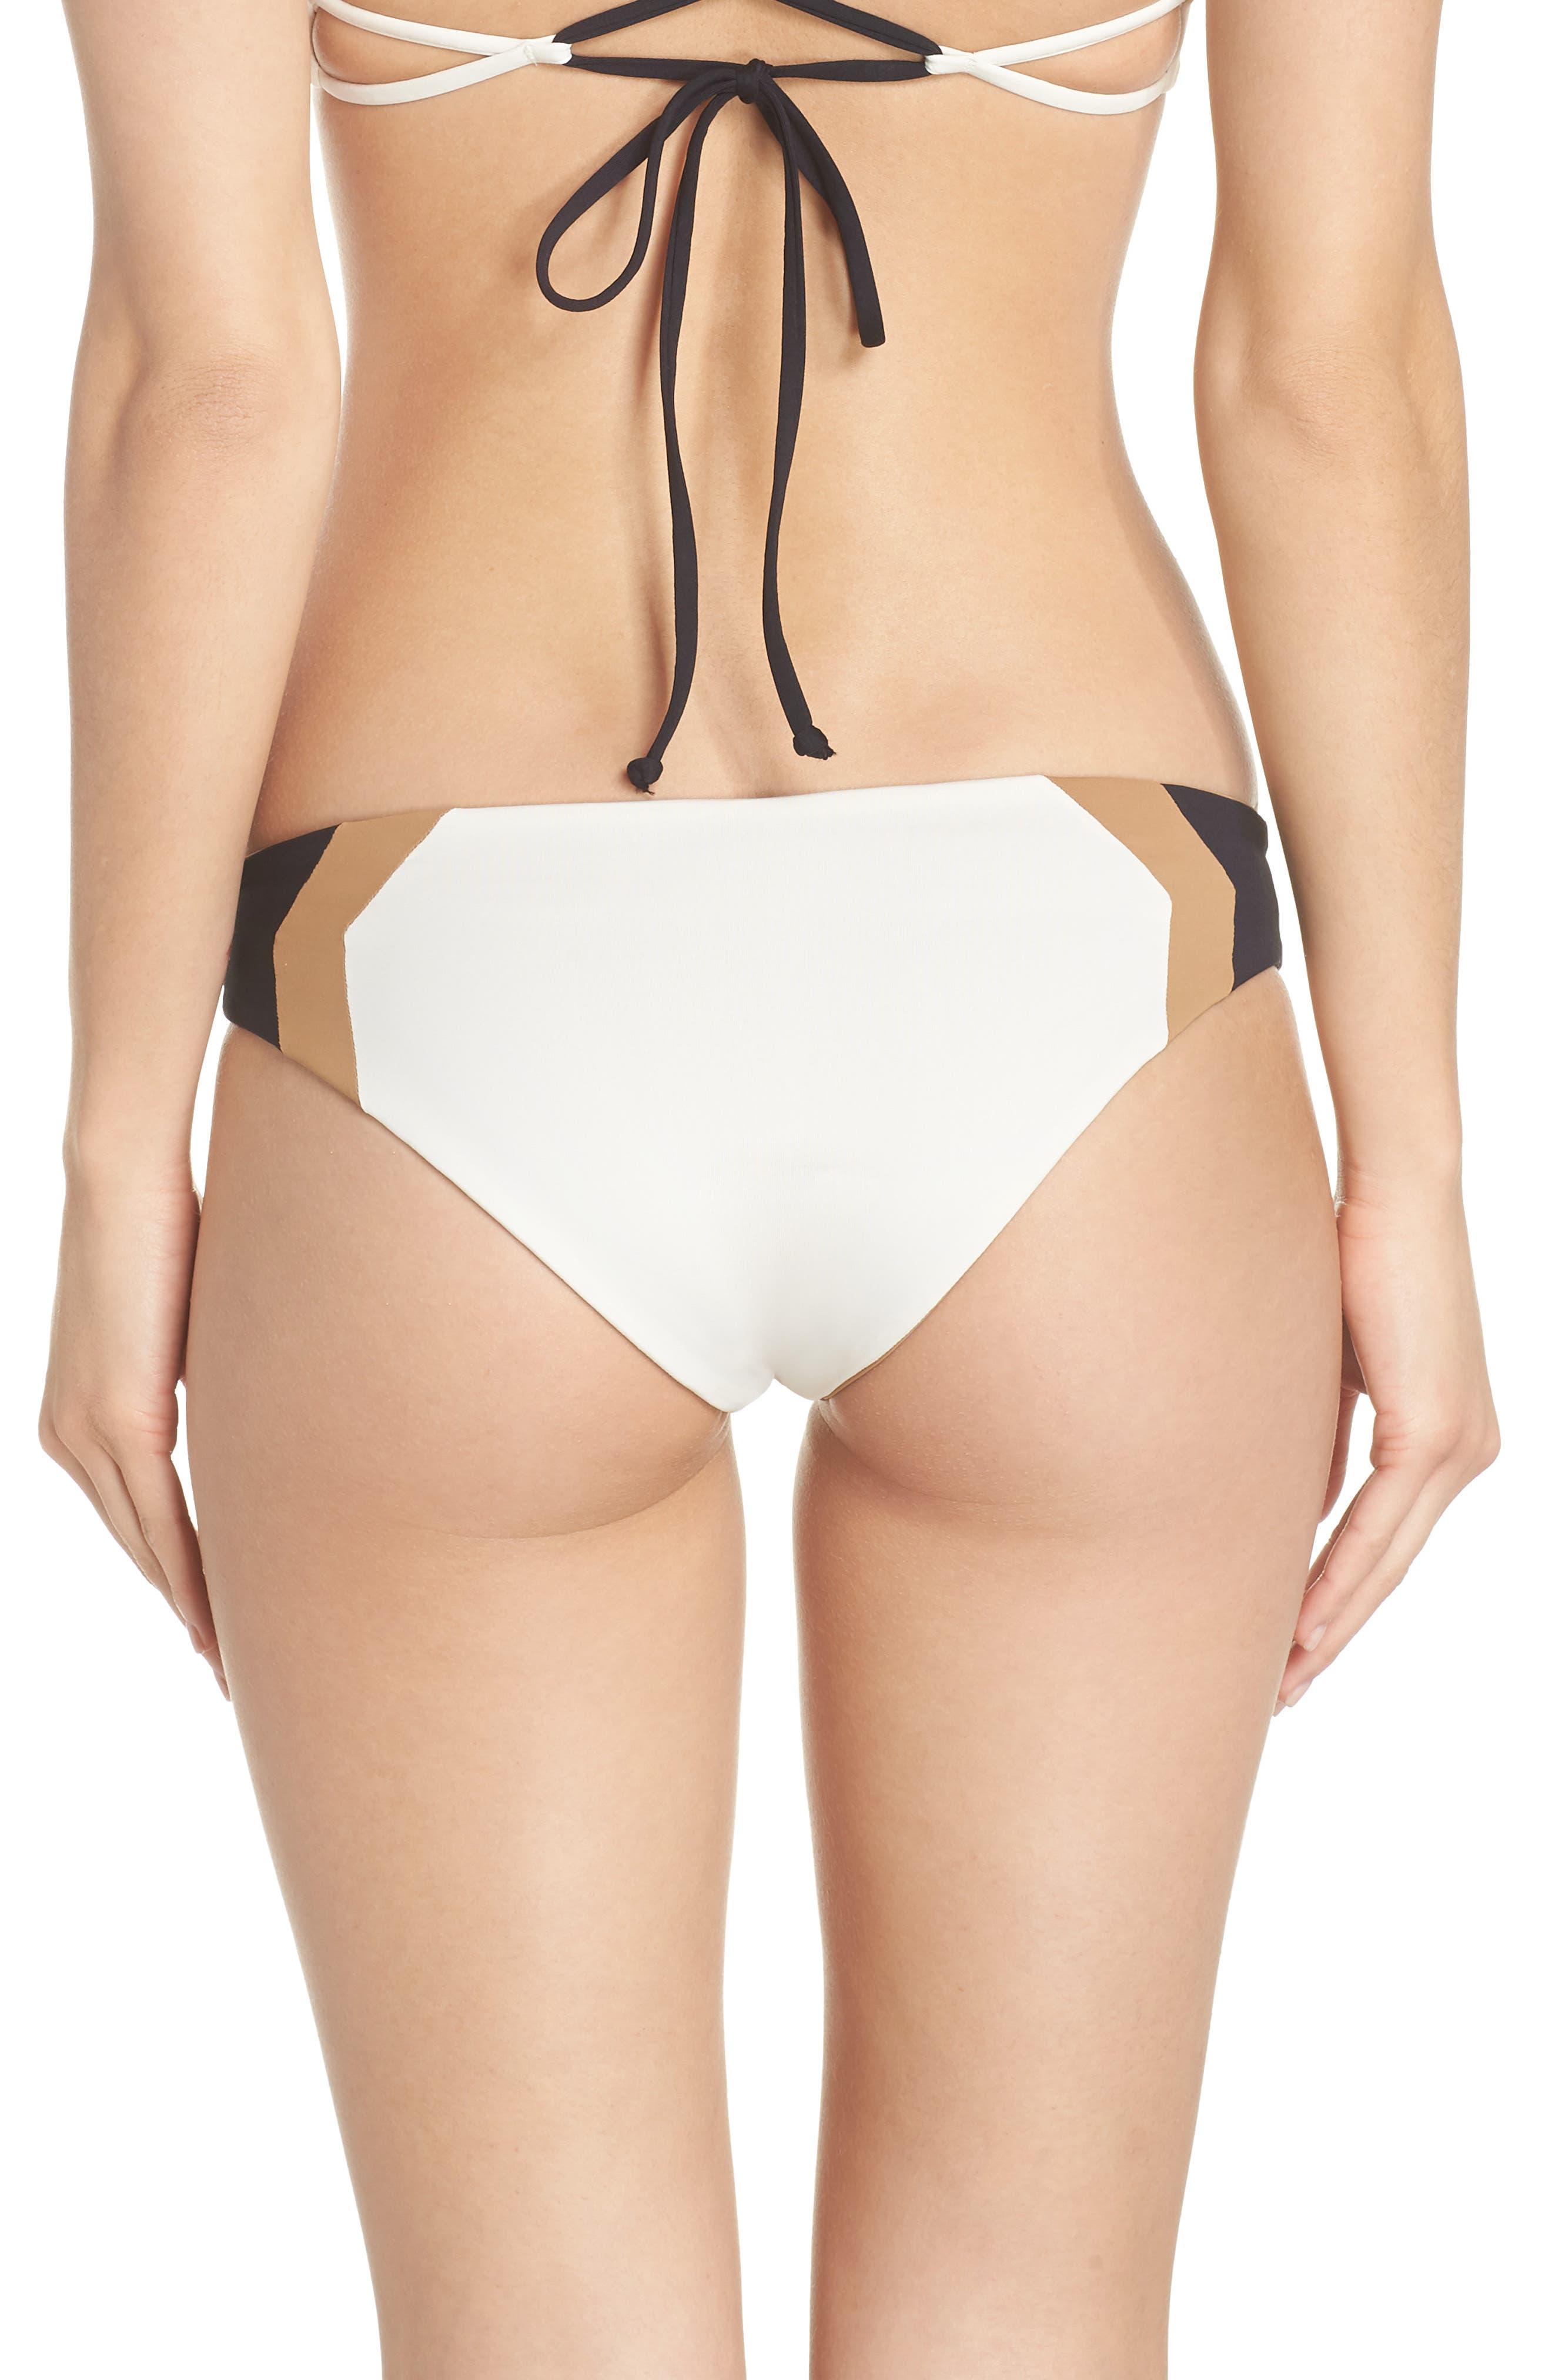 Baracuda Reversible Classic Hipster Bikini Bottoms,                             Alternate thumbnail 2, color,                             Cream/ Black/ Camel